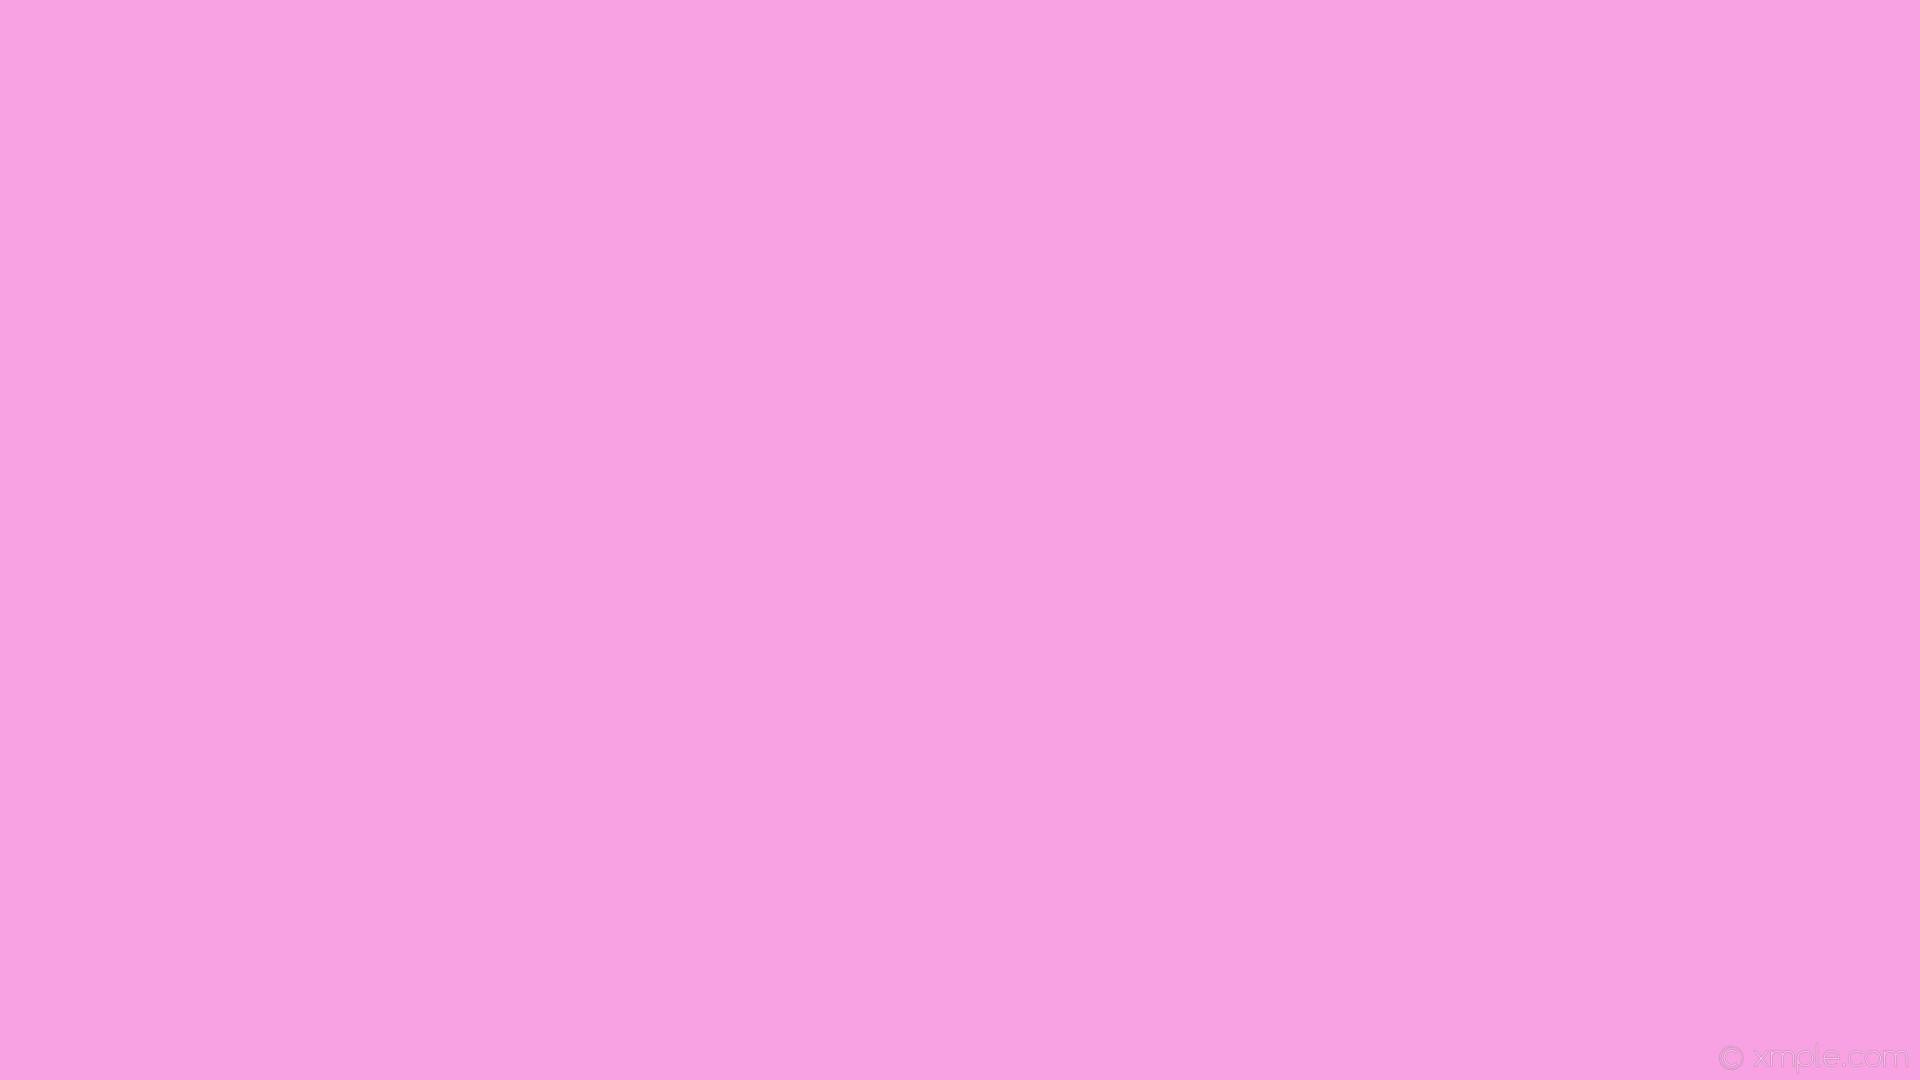 wallpaper single one colour solid color plain pink light pink #f9a2e3